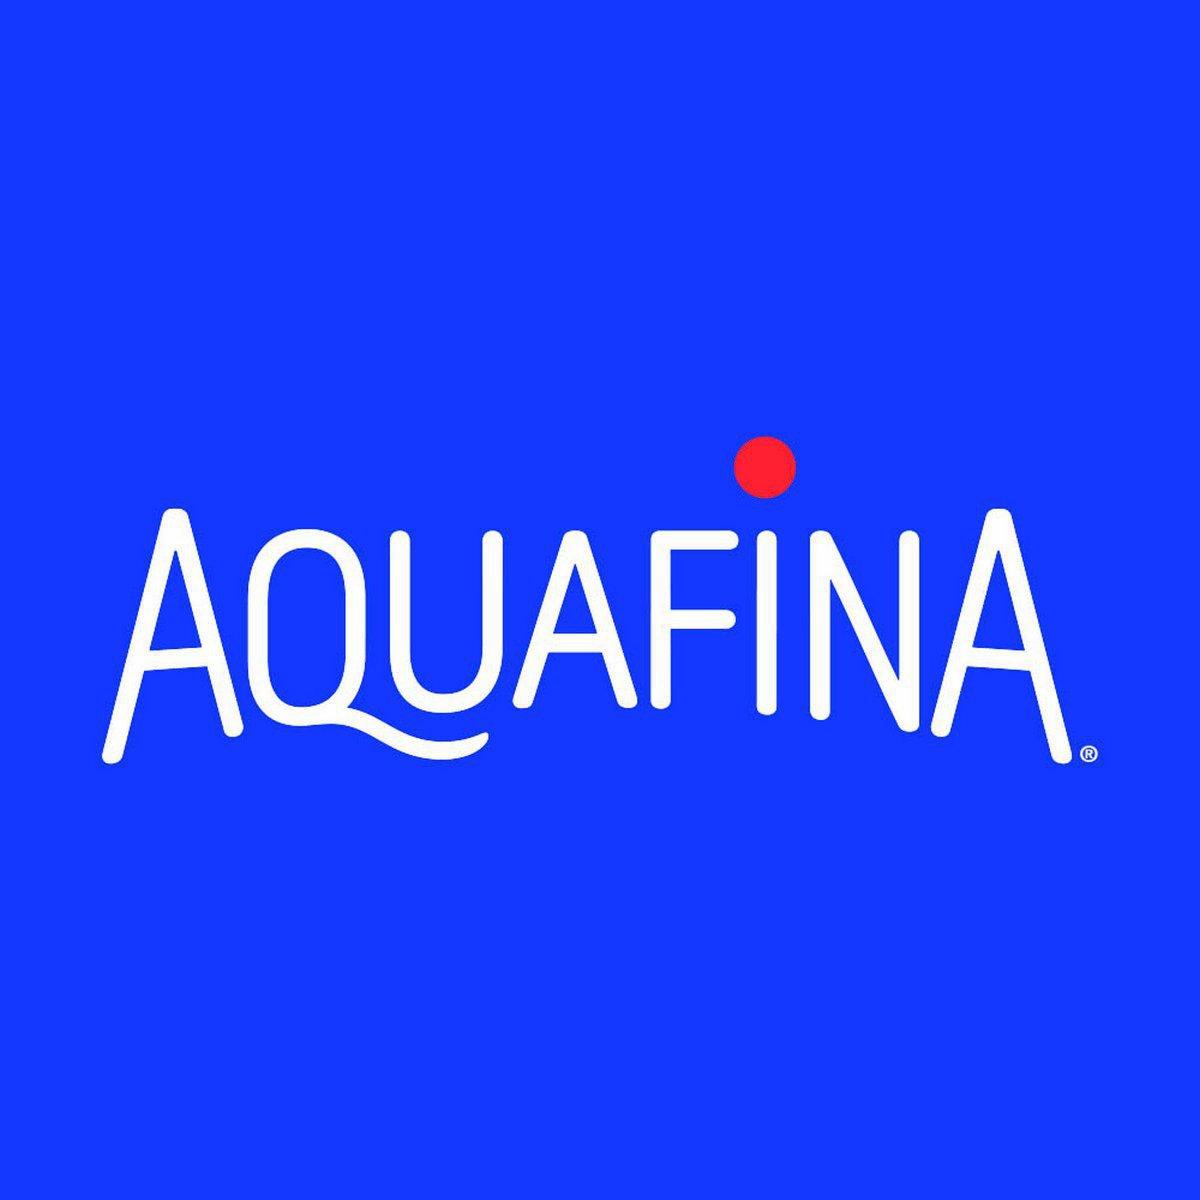 Marketing Strategy of Aquafina - Aquafina Marketing Strategy